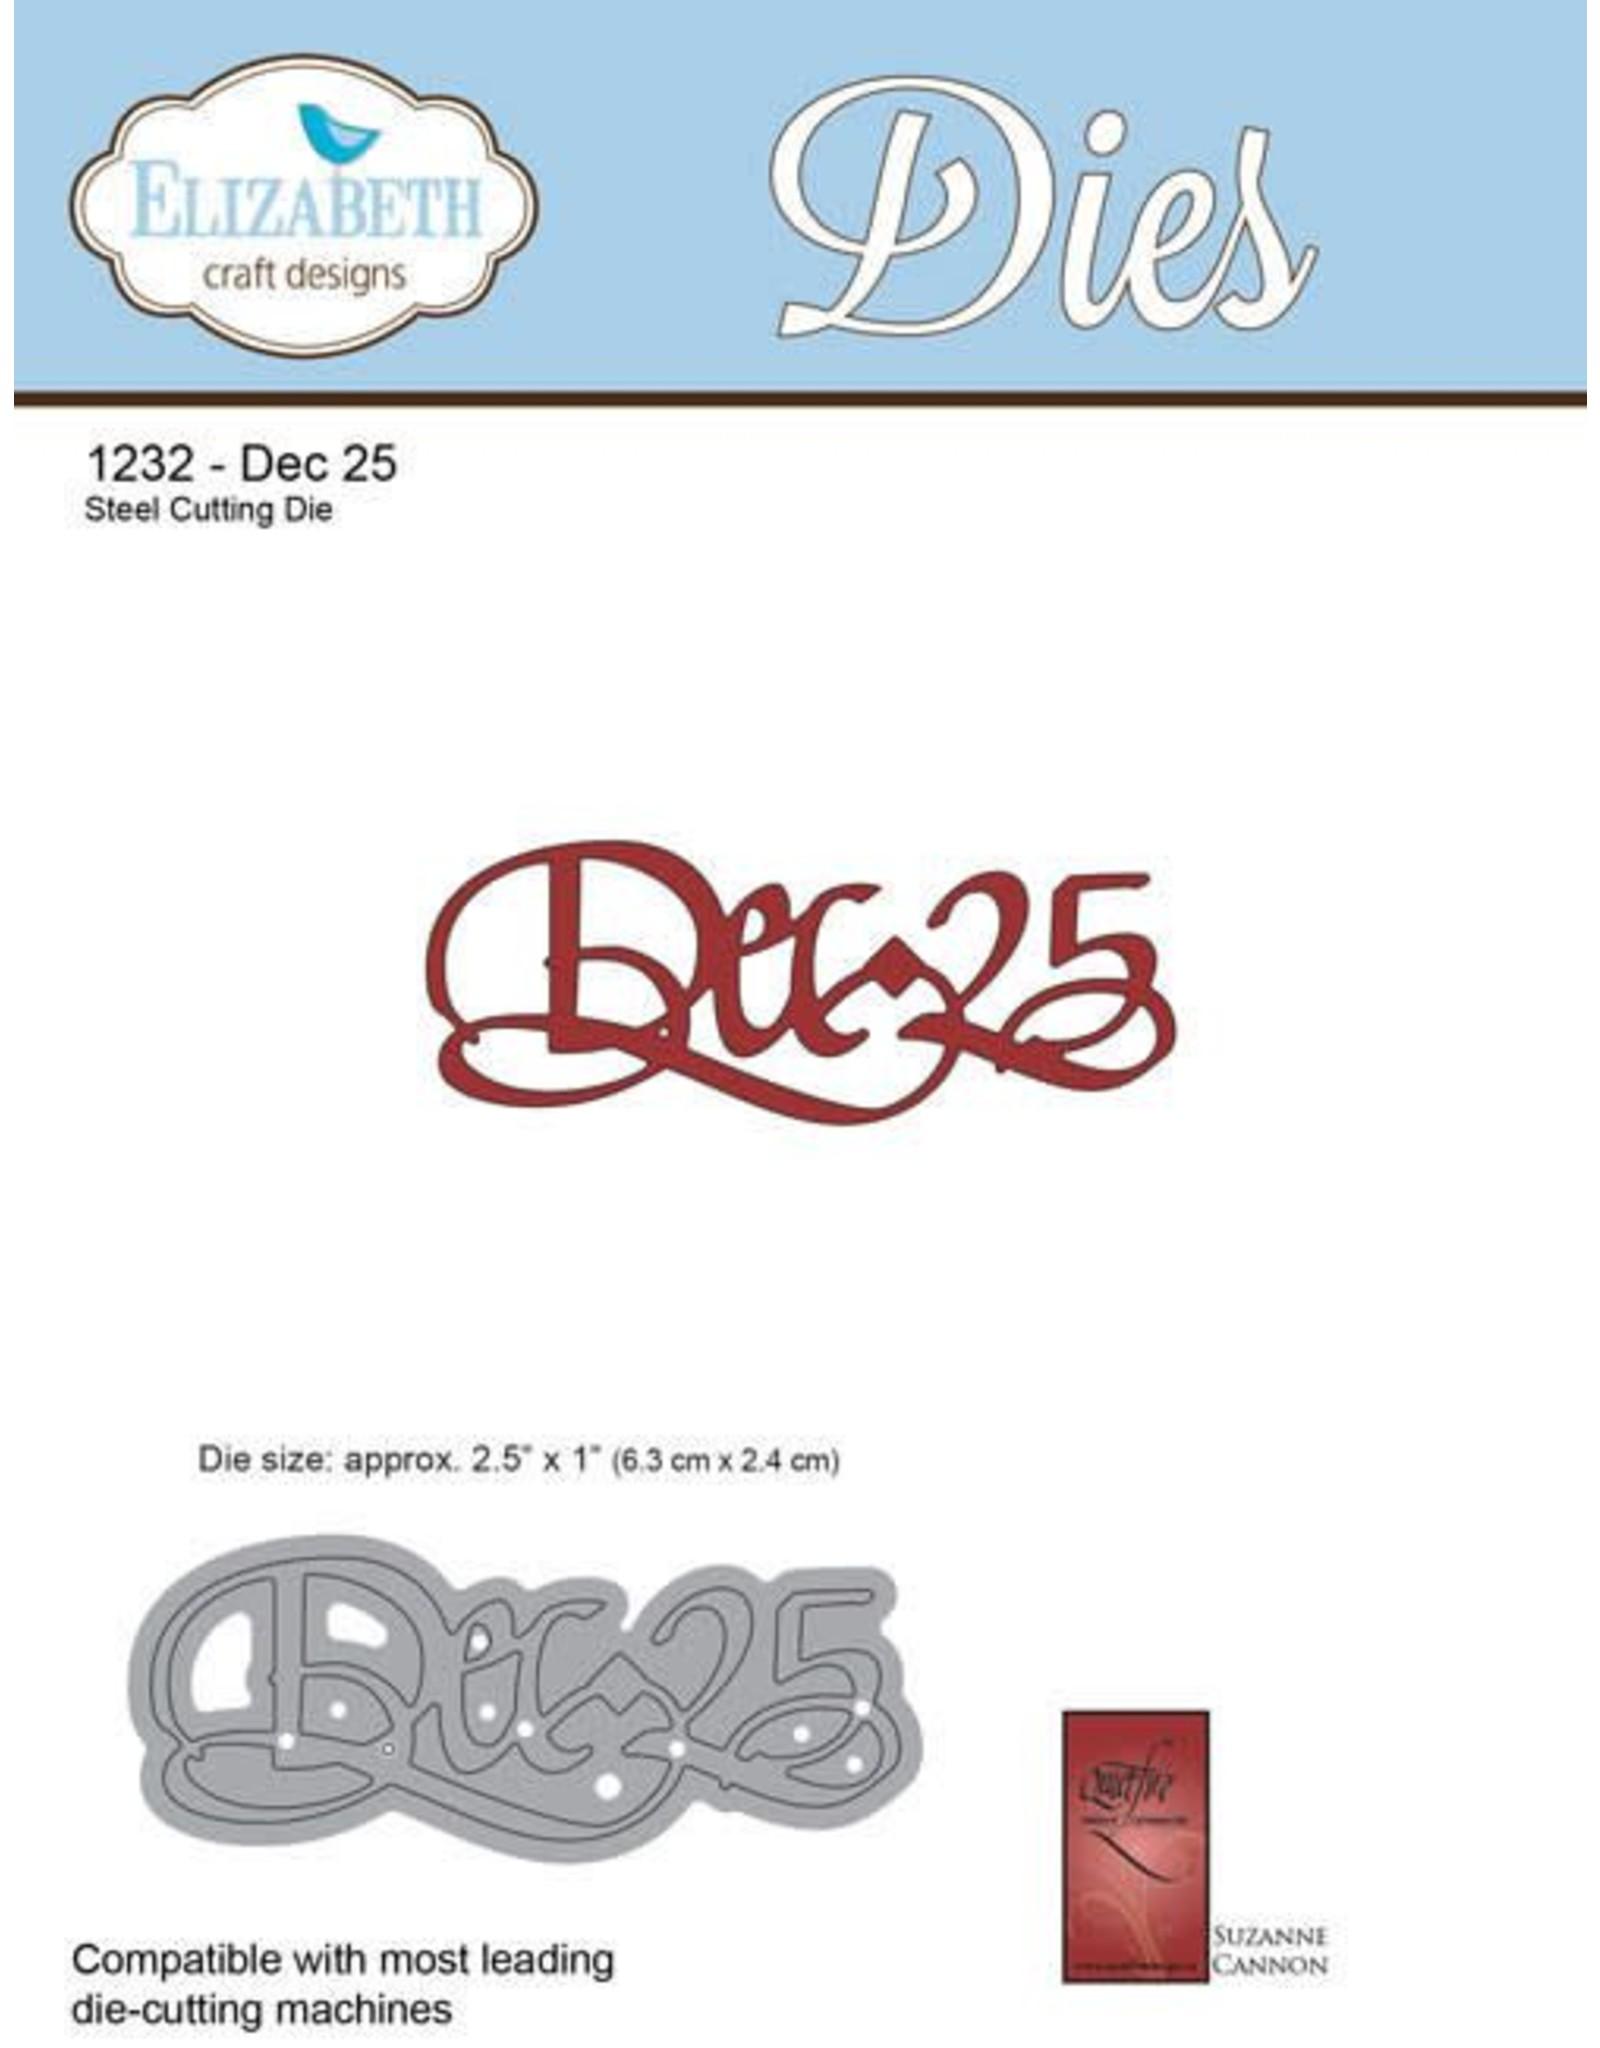 Elizabeth Craft Designs Elizabeth Craft Designs dies A Way With Words, Dec-25 1232